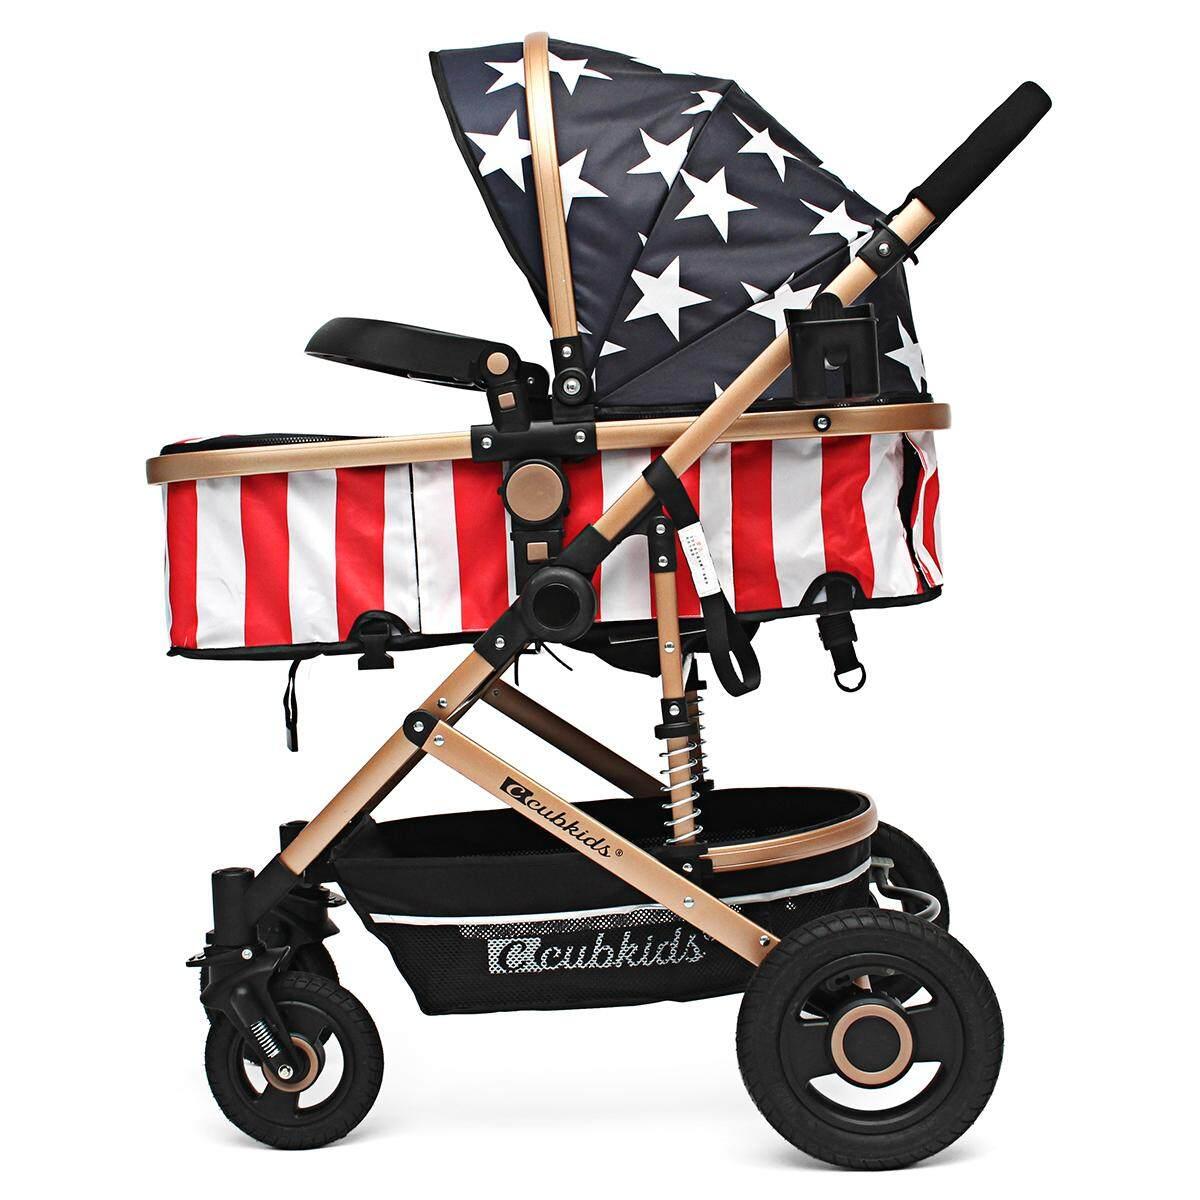 Foldable Pram Pushchair Newborn Baby Stroller Buggy Carriage Infant Travel Car